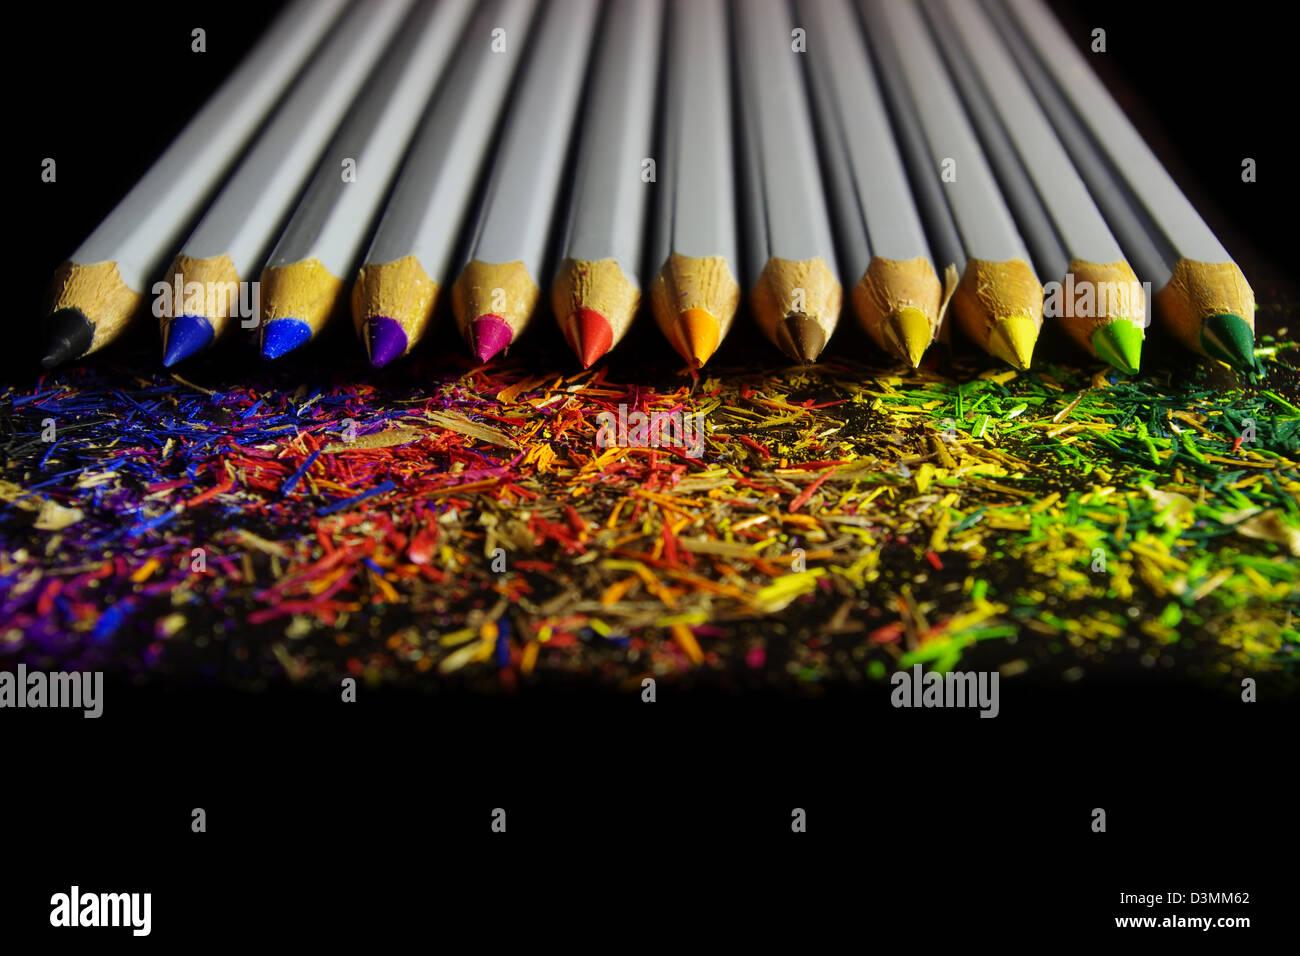 Black Pencil Shavings Stockfotos & Black Pencil Shavings Bilder - Alamy